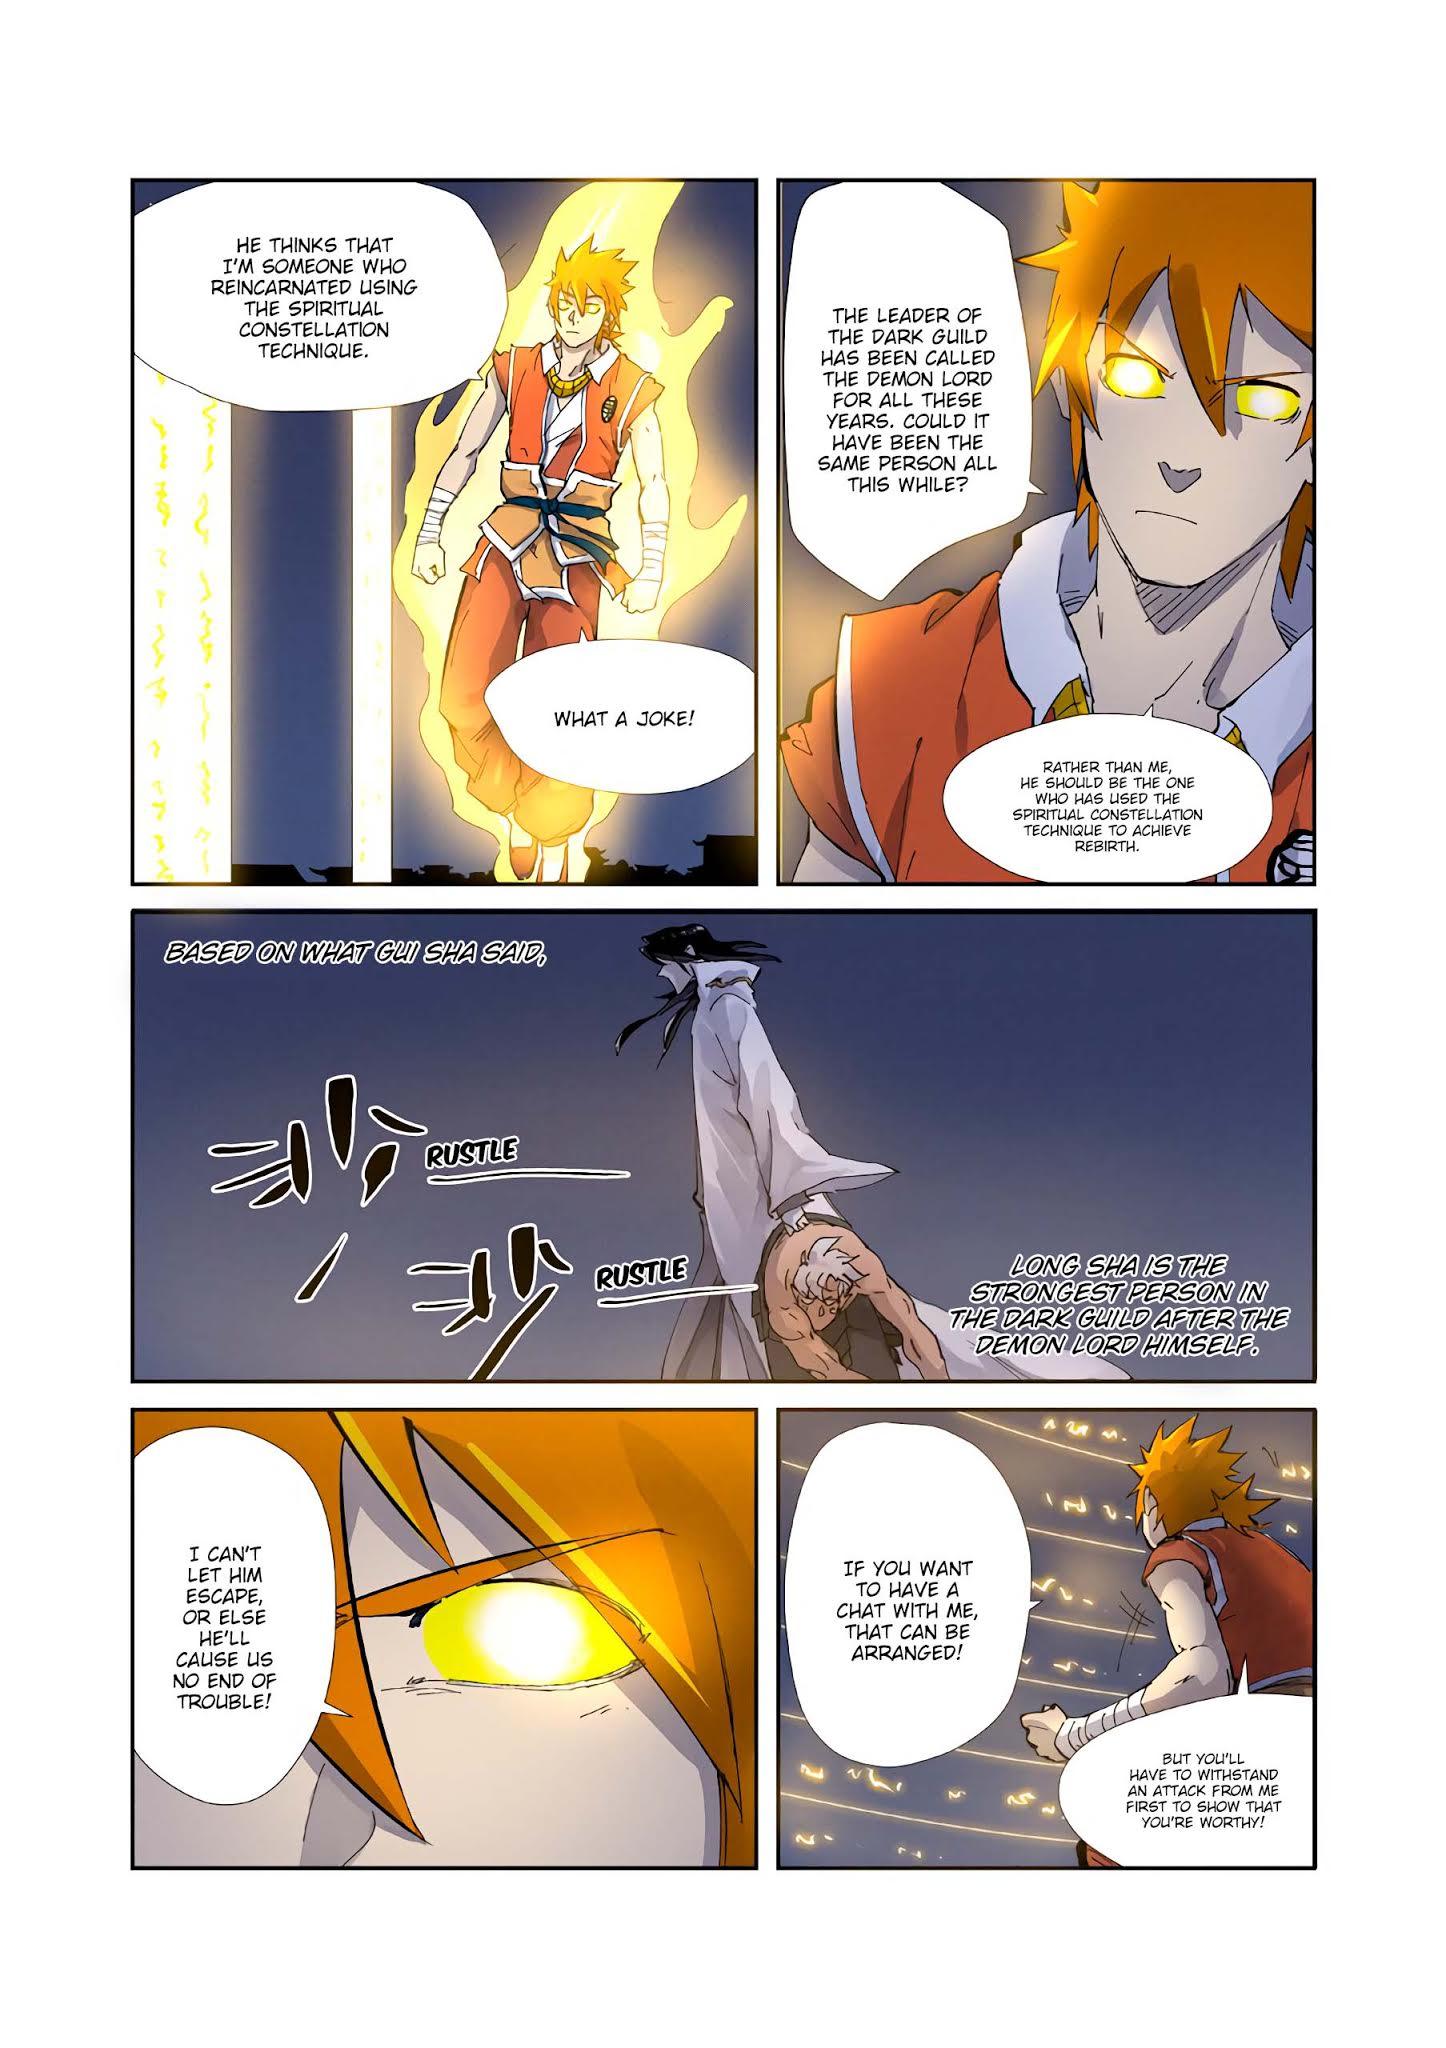 Tales of Demons and Gods chapter 212-5 english - YouBa Manga